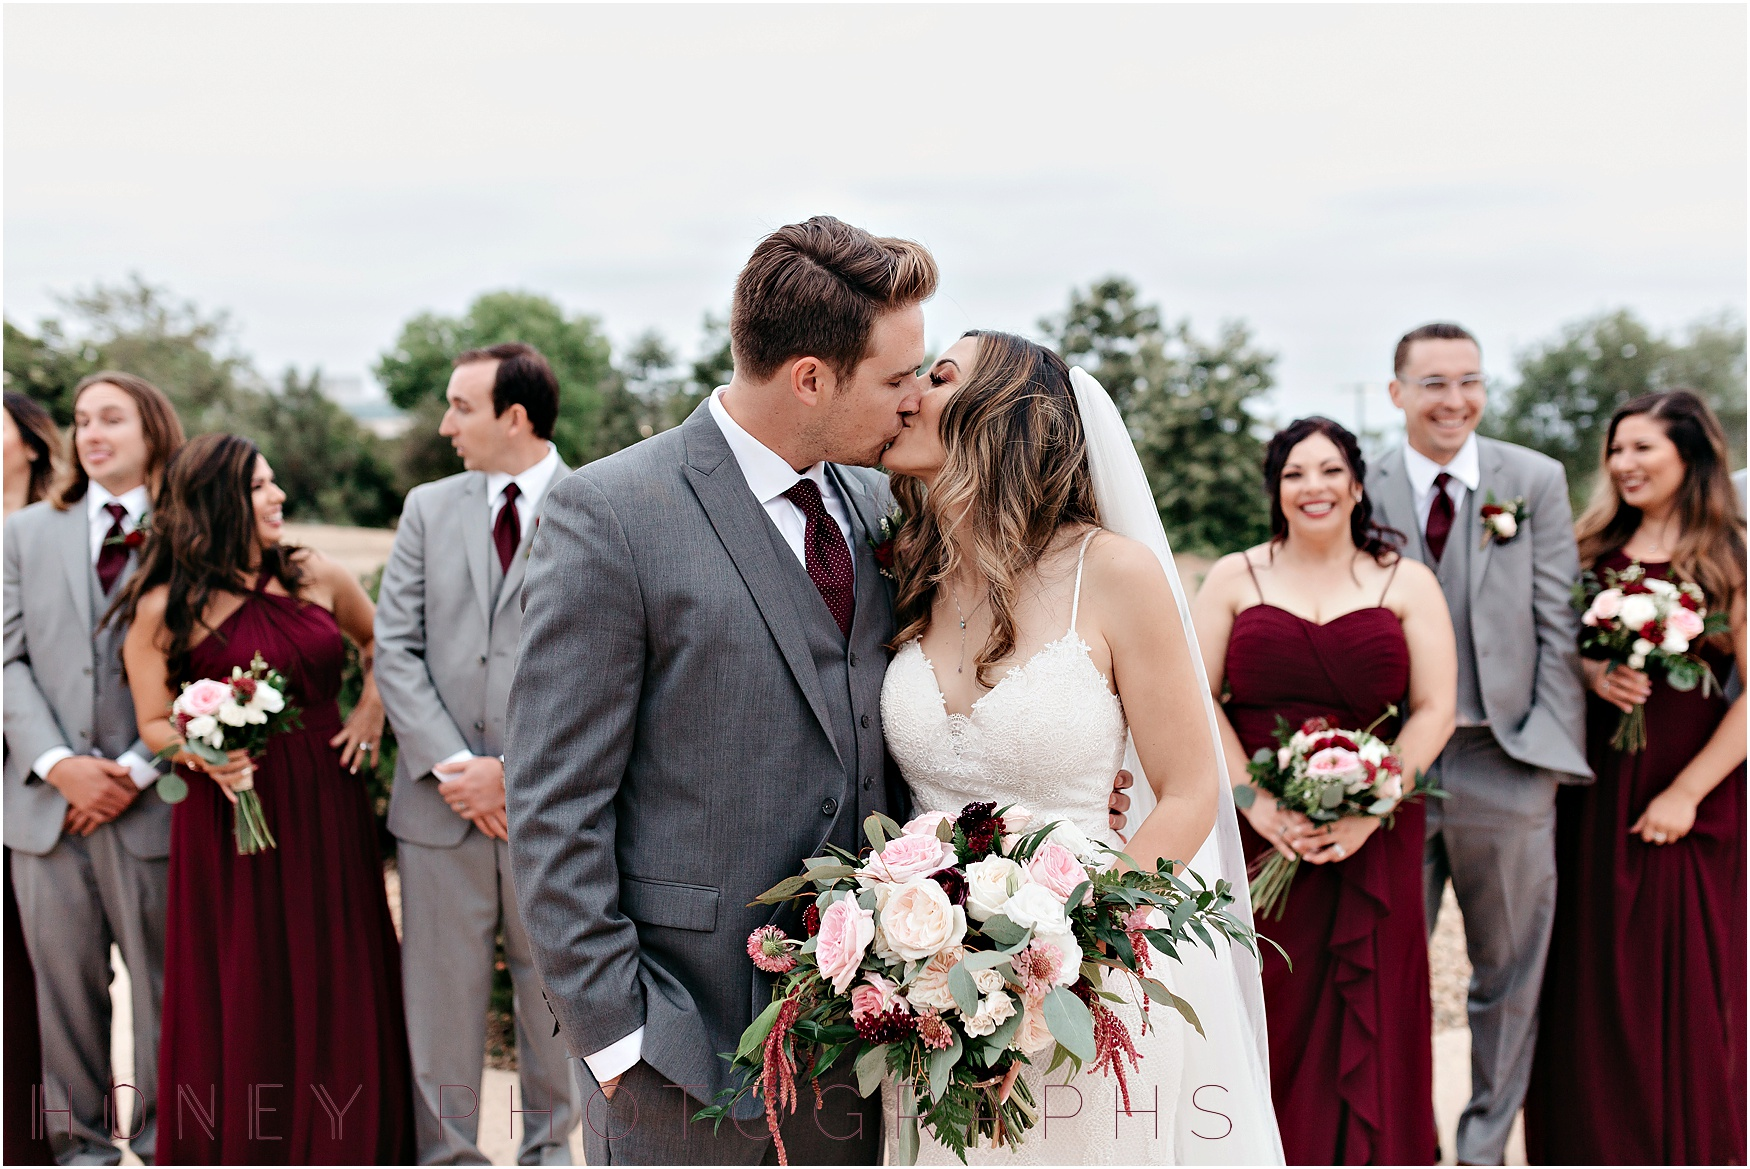 garden-classic-burgundy-jewel-tone-luxury-pacific-event-oceanside-wedding37.jpg